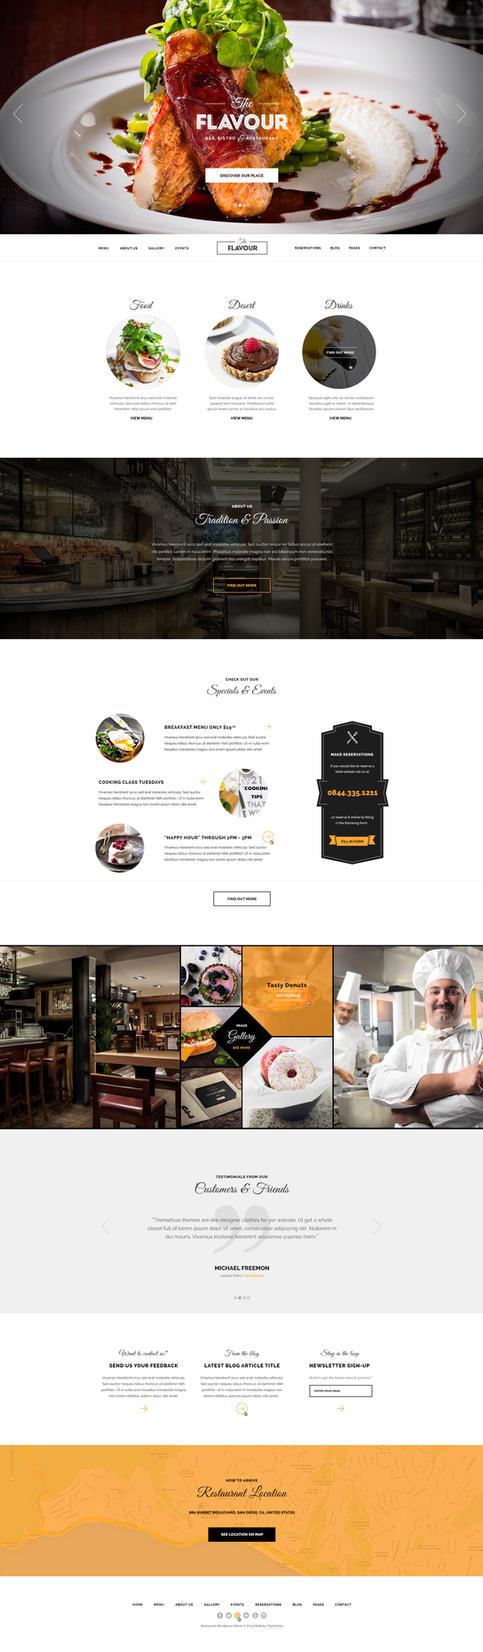 01.Homepage slide1 by ThemeFuse